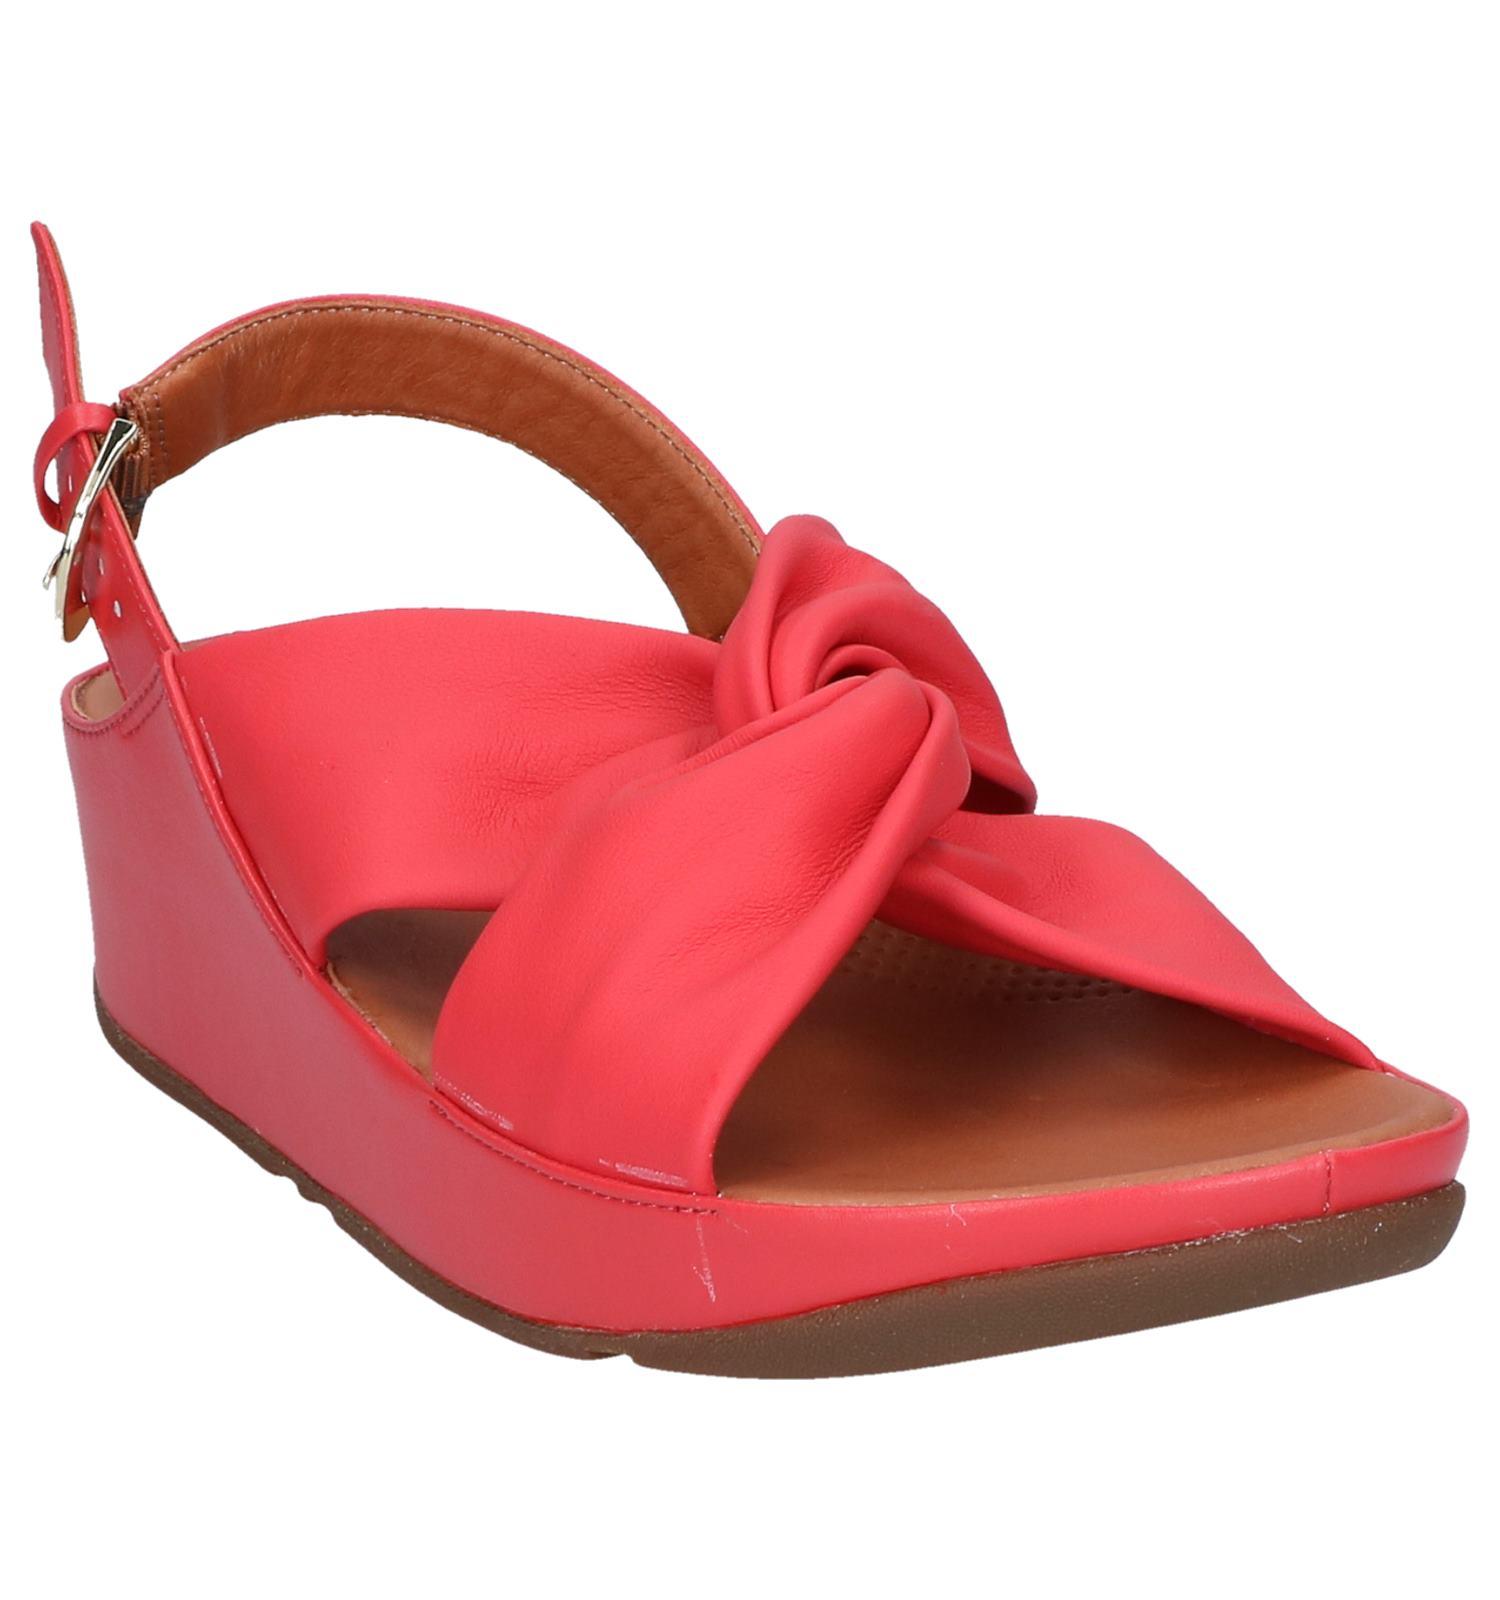 Twiss Rode Sandalen Sandalen Twiss Sandalen Rode Fitflop Rode Rode Fitflop Fitflop Twiss Sandalen iXZukPO